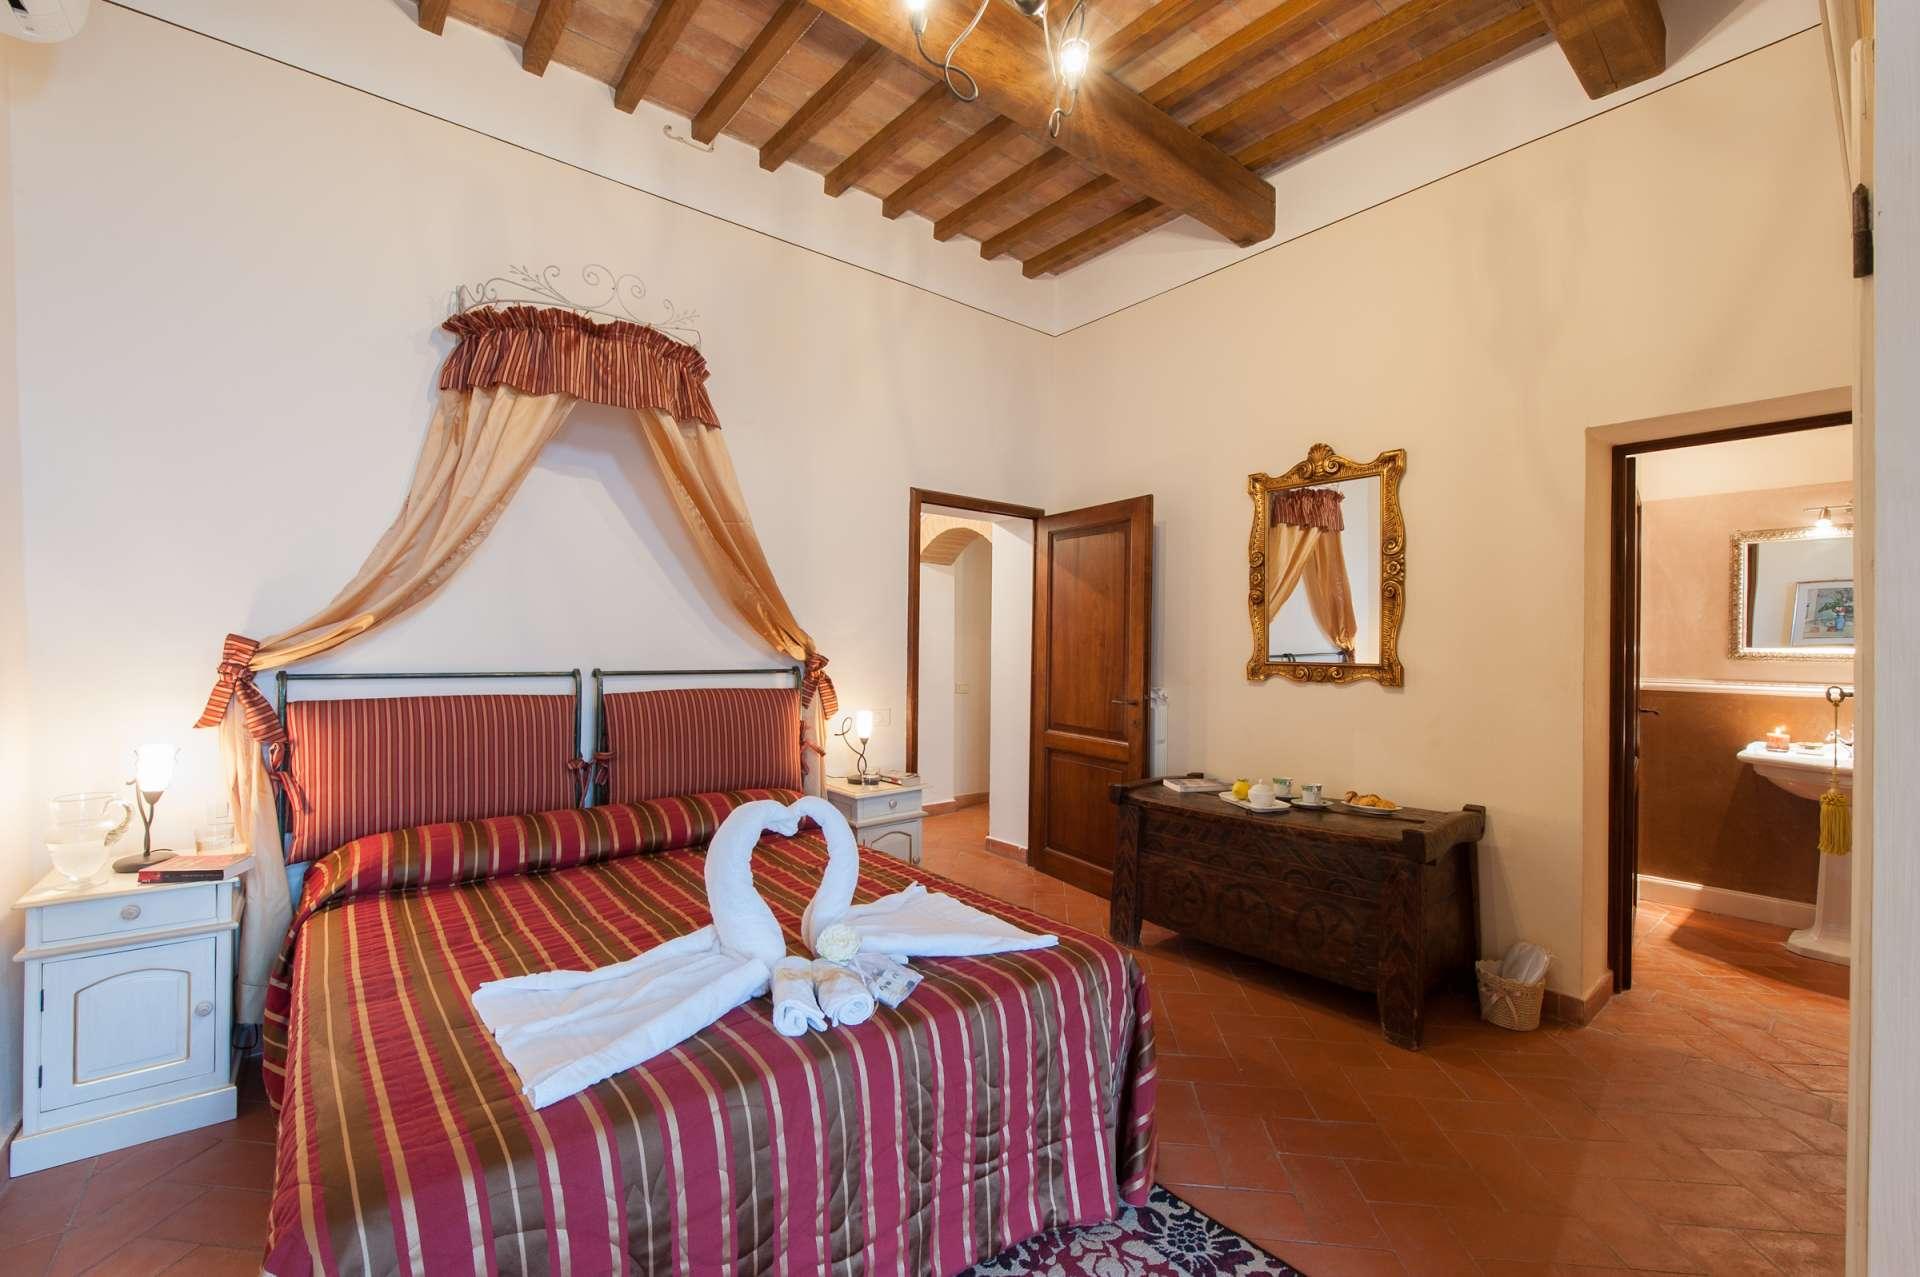 San Leolino 5 Bed Luxury Villa With Pool San Gimignano